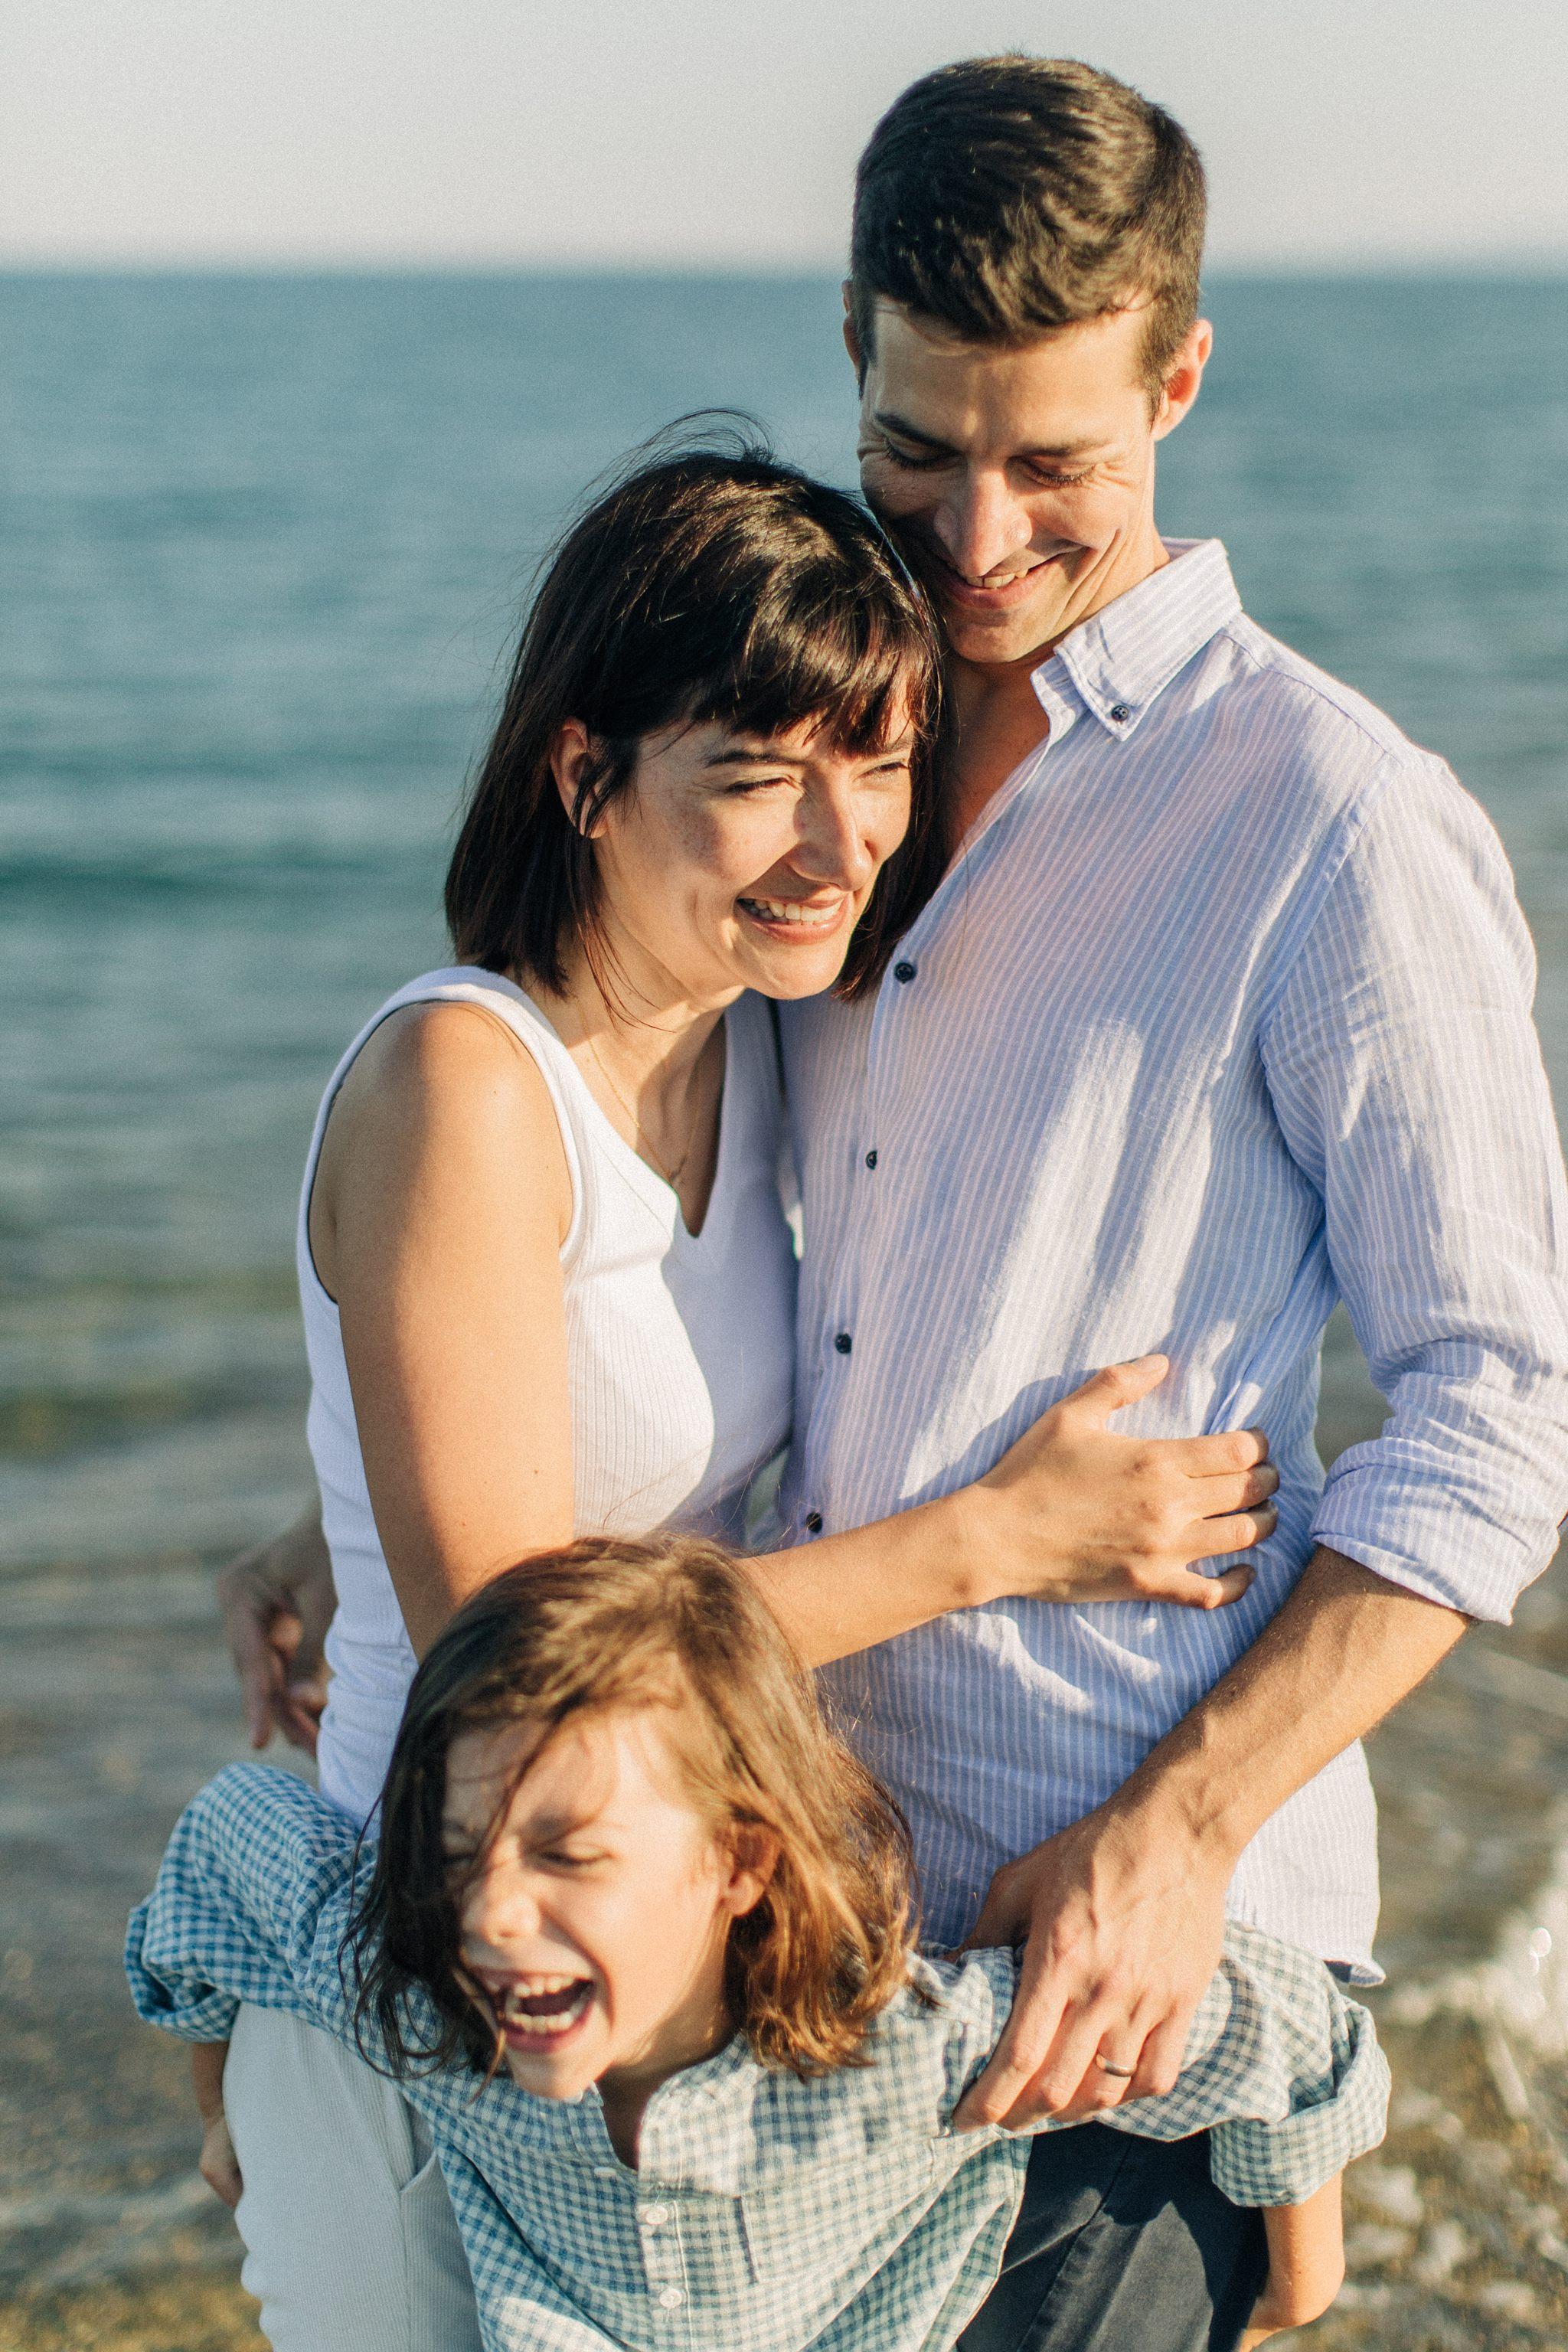 Mariage-a-la-maison-secall-hugo-hennequin-photographe-mariage-perpignan_0148.jpg